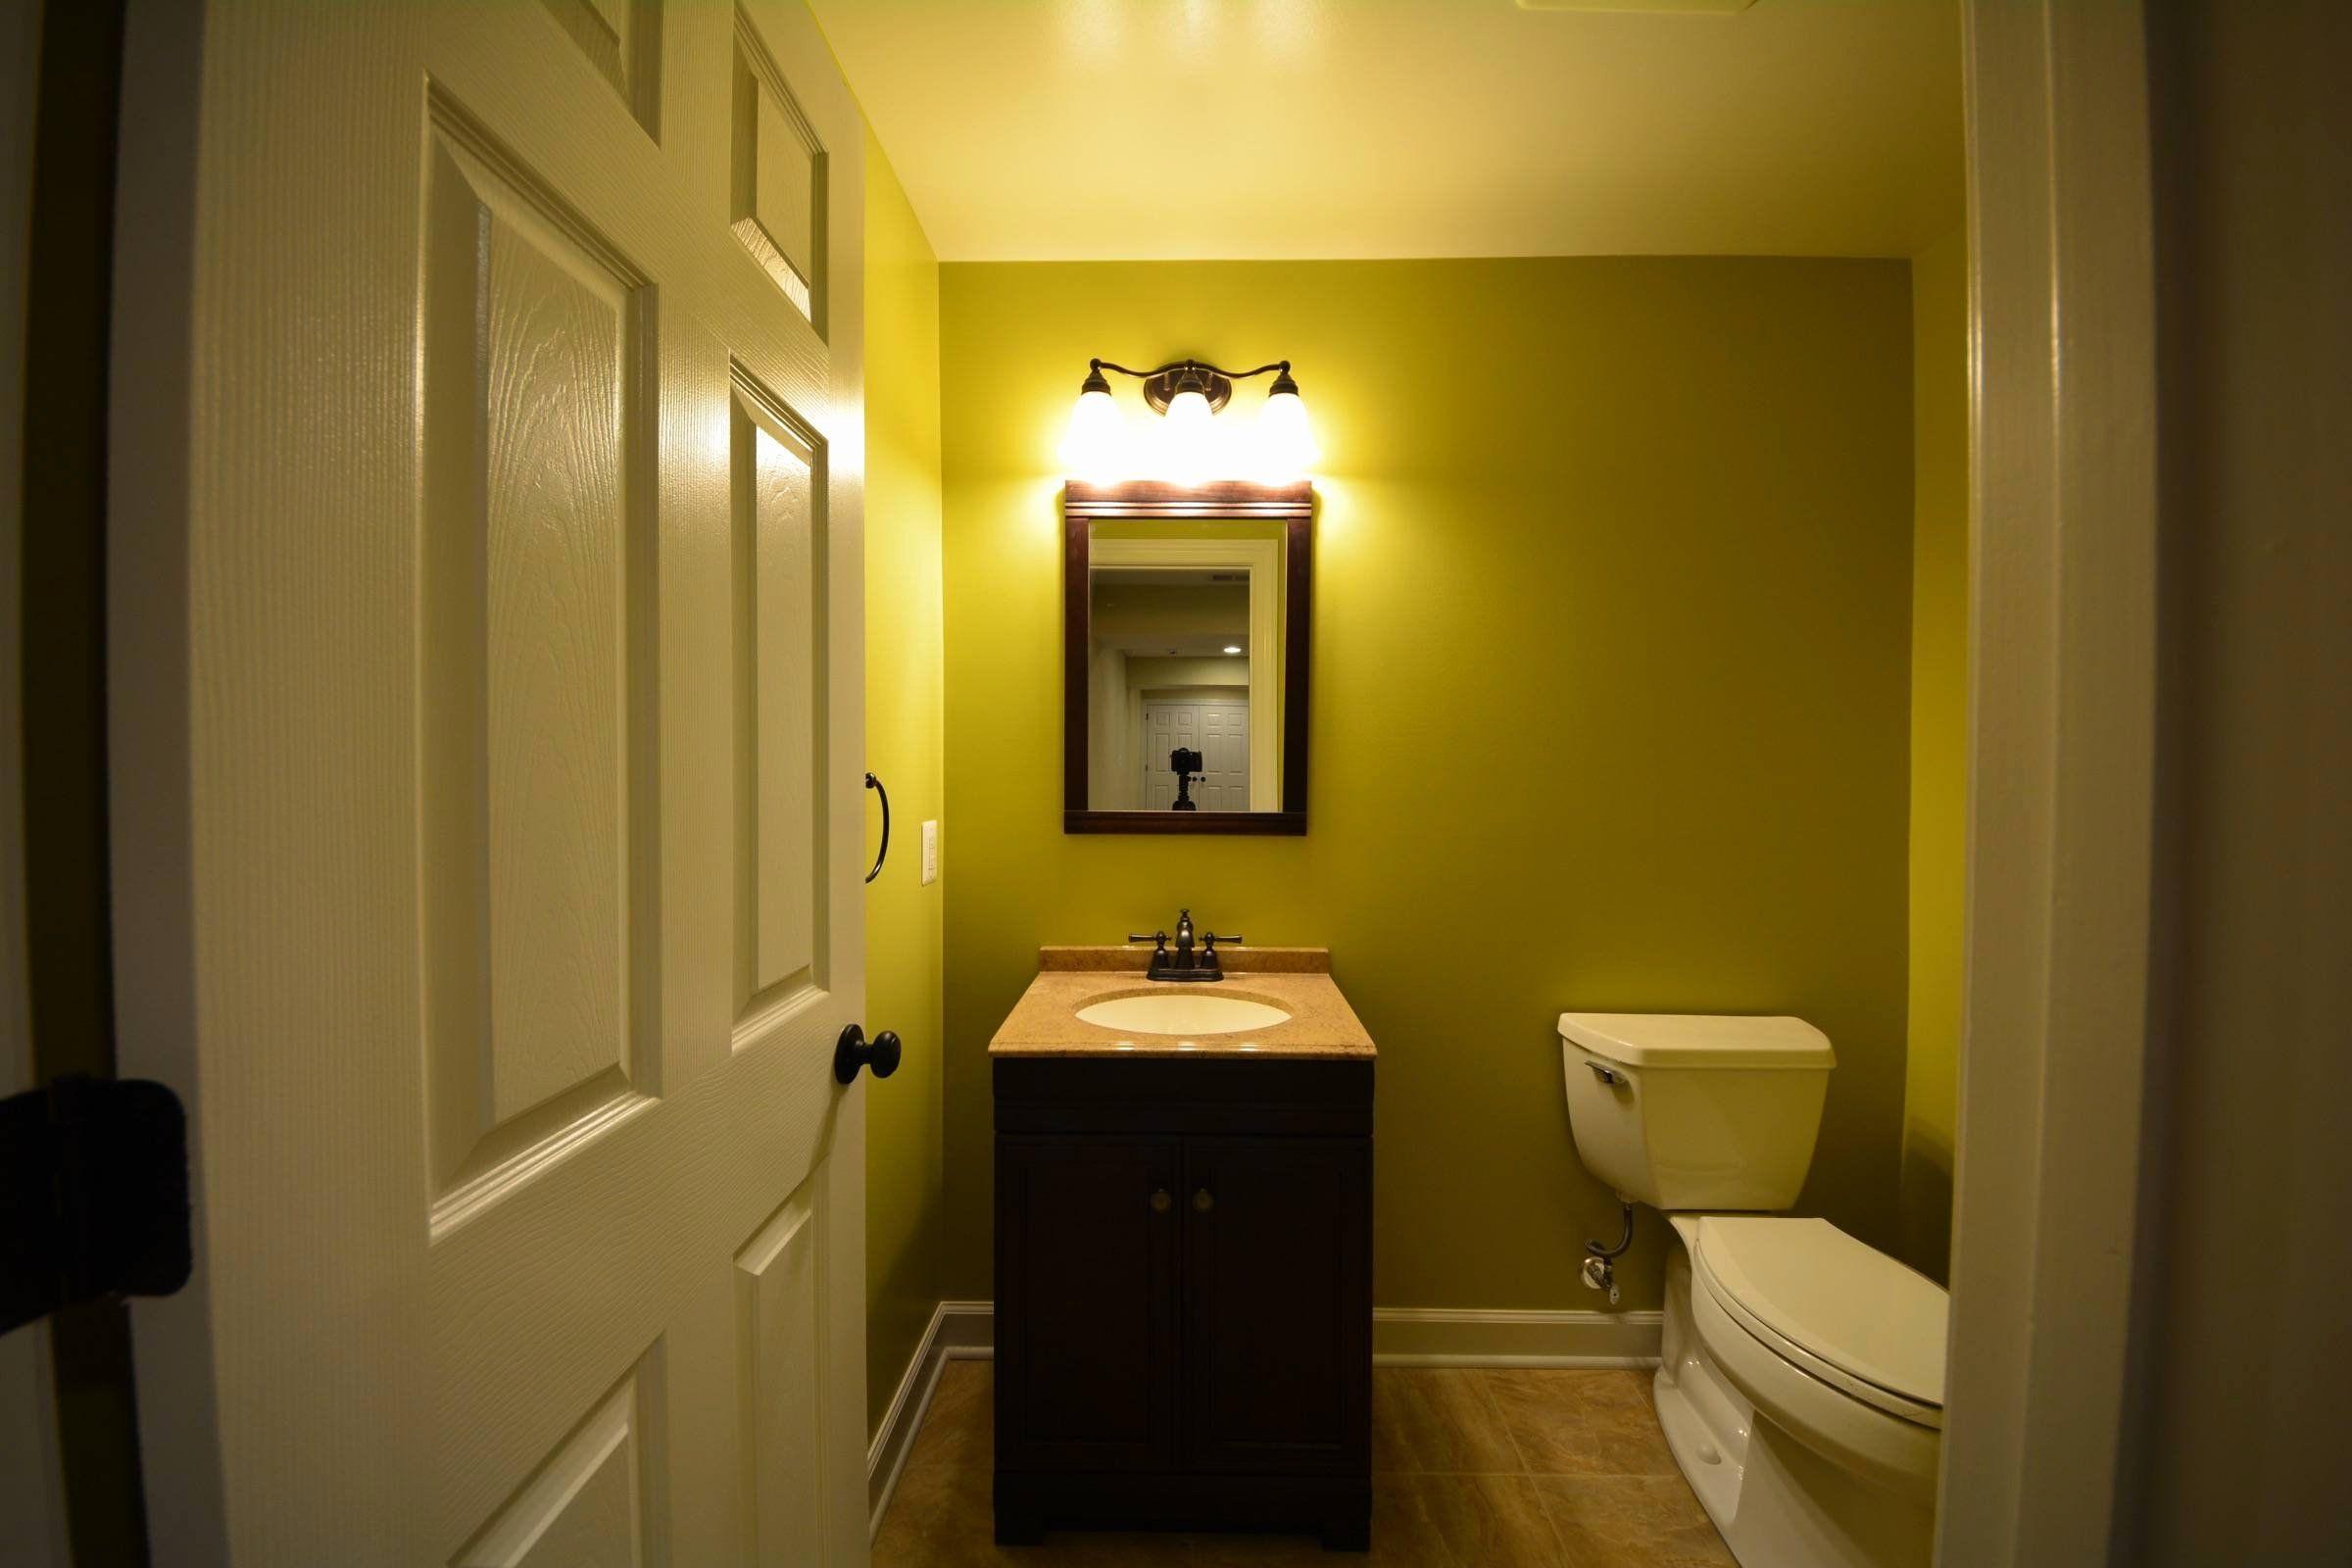 Small Basement Bathroom Ideas Lovely Basement Half Bathrooms Ideas Basement Masters In 2020 Basement Bathroom Remodeling Small Basement Bathroom Small Half Bathrooms